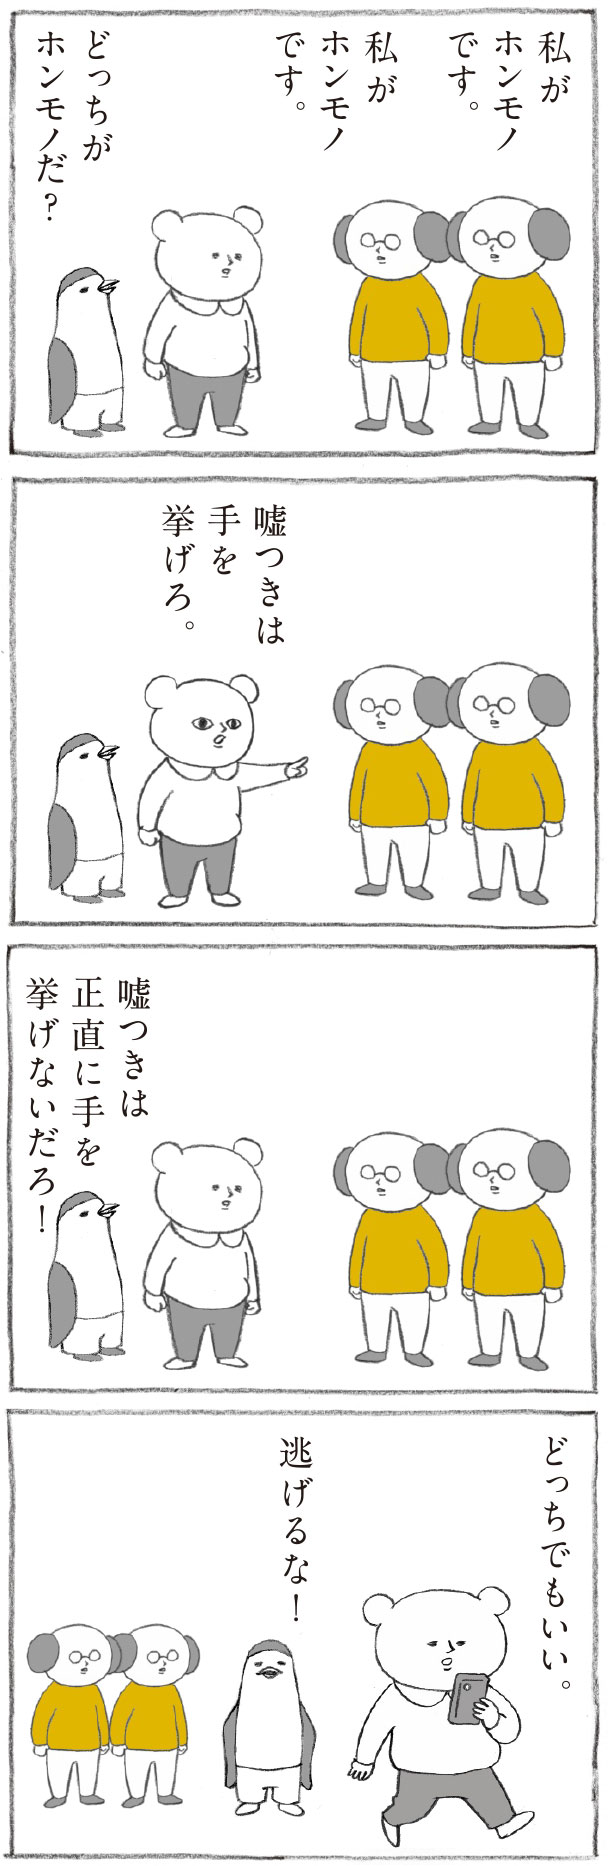 Hanako 1175号:おかわり自由